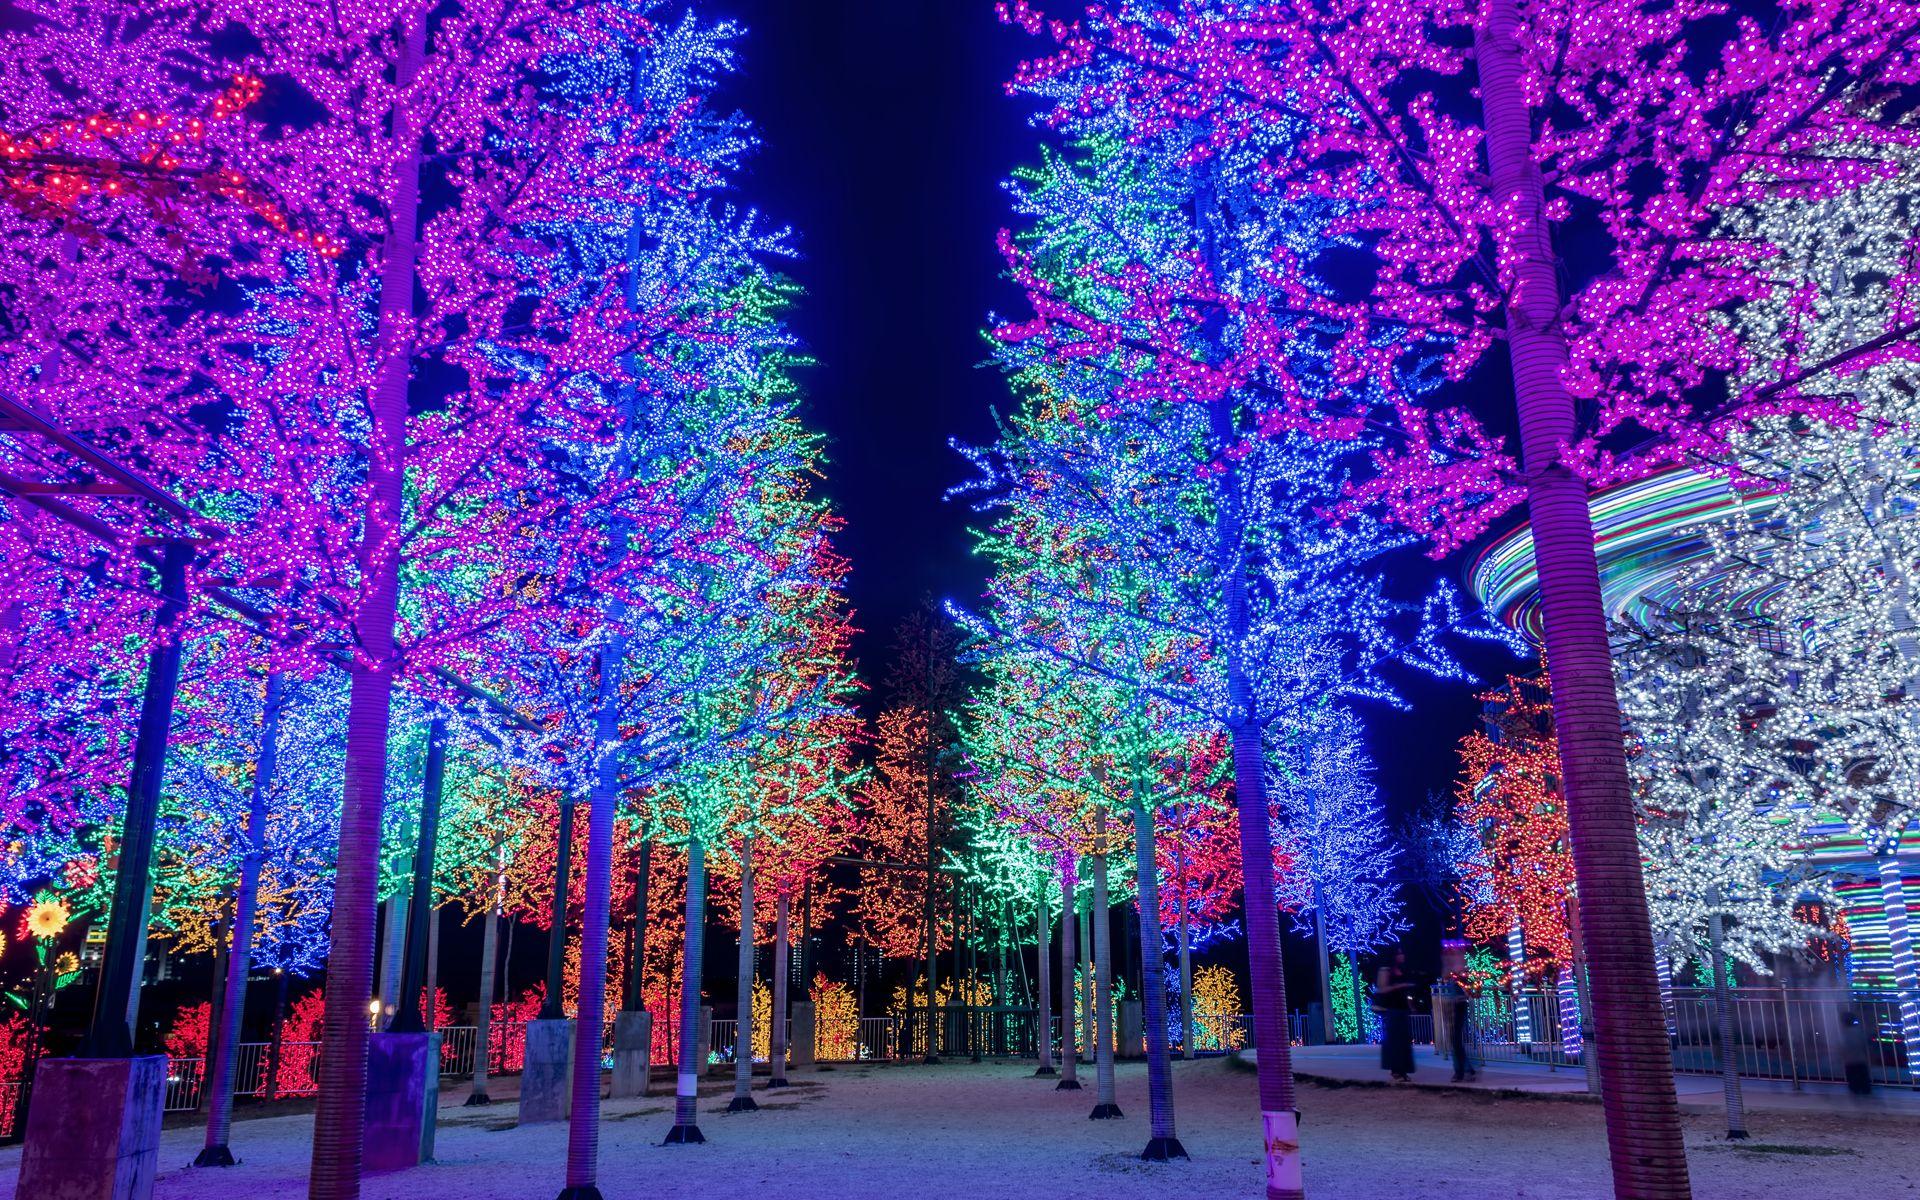 Boomverlichting Den Haag